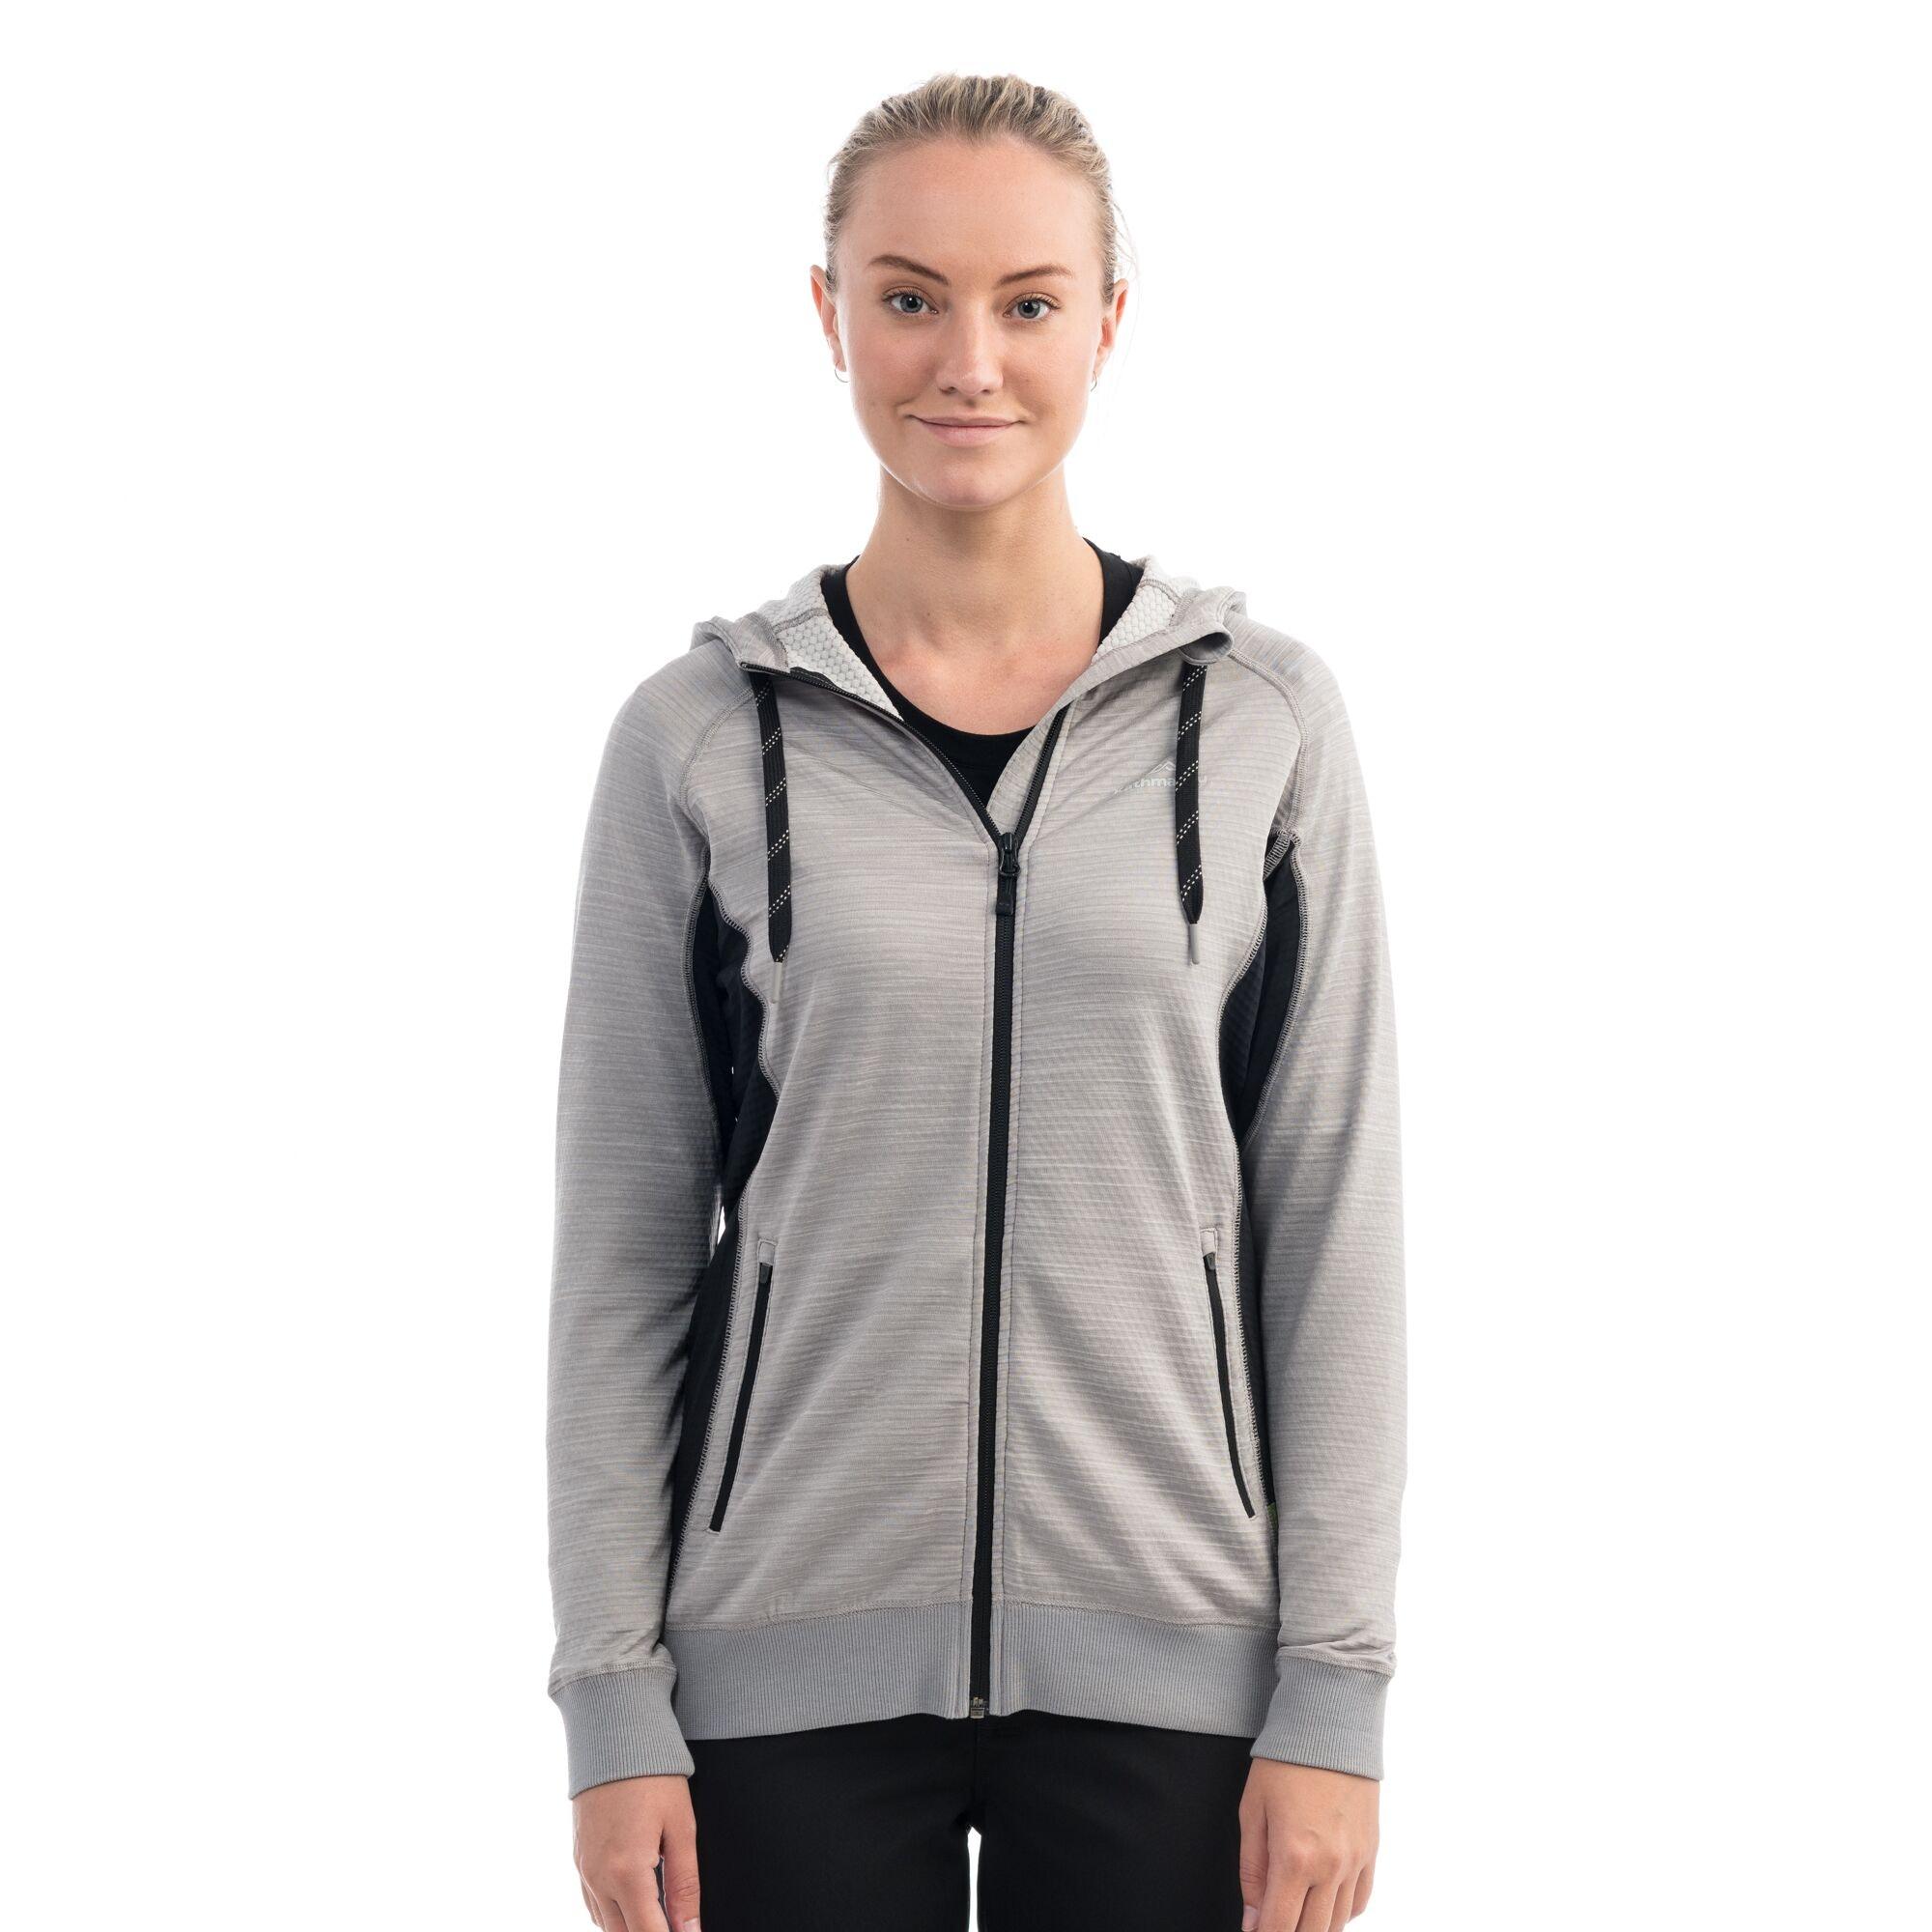 NEW-Kathmandu-Acota-Women-s-Hooded-Fleece-Lightweight-Breathable-Outdoor-Jacket thumbnail 29